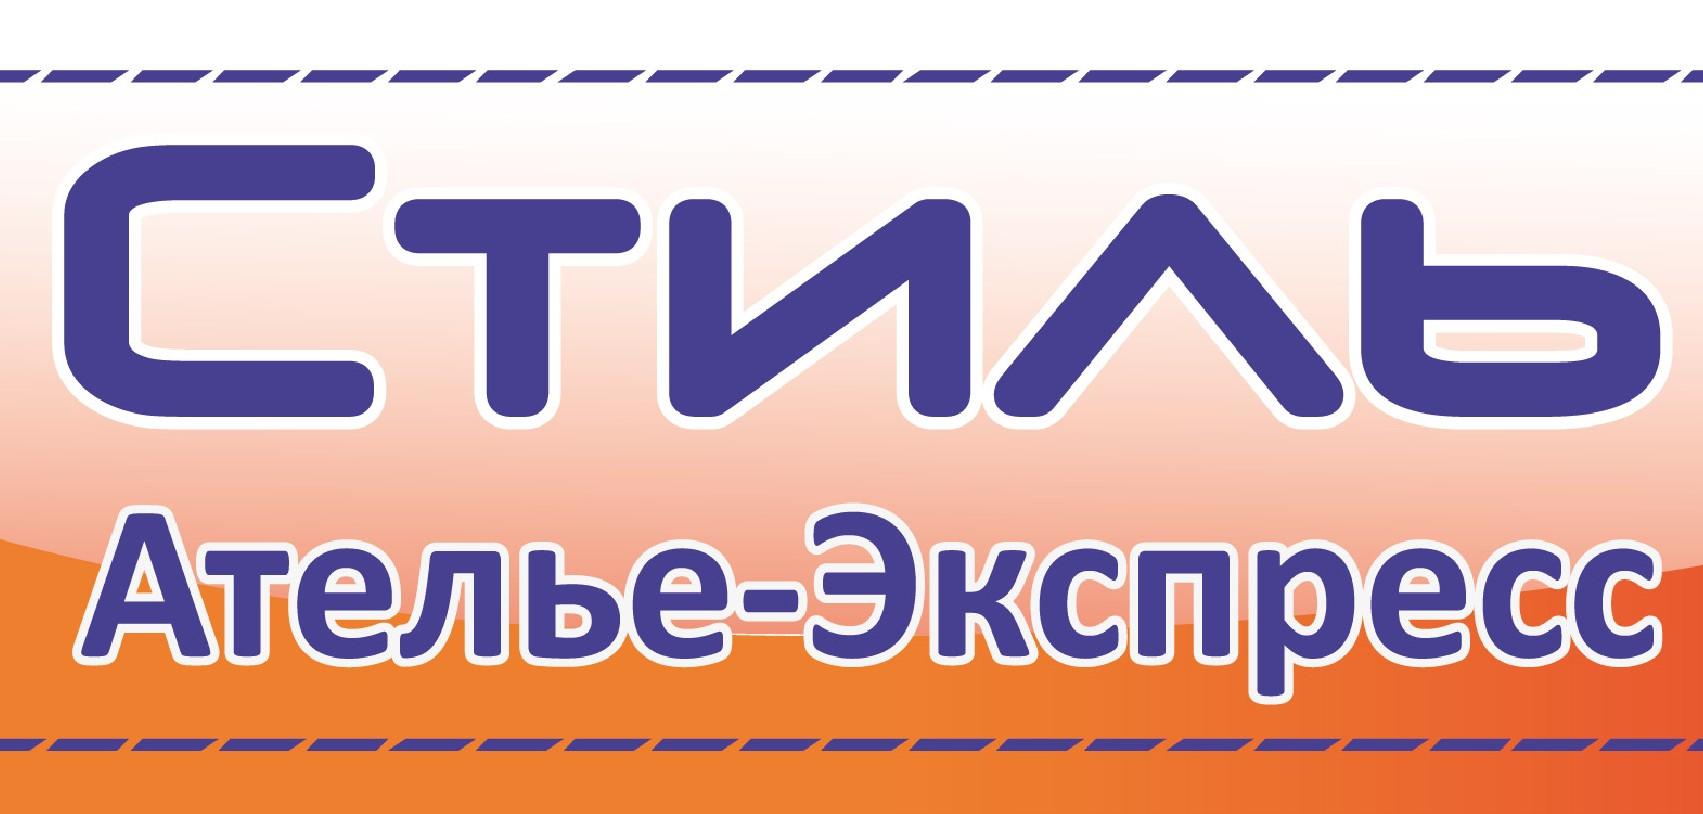 Работа в компании «ИП Новикова Юлия Николаевна» в Санкт-Петербурга